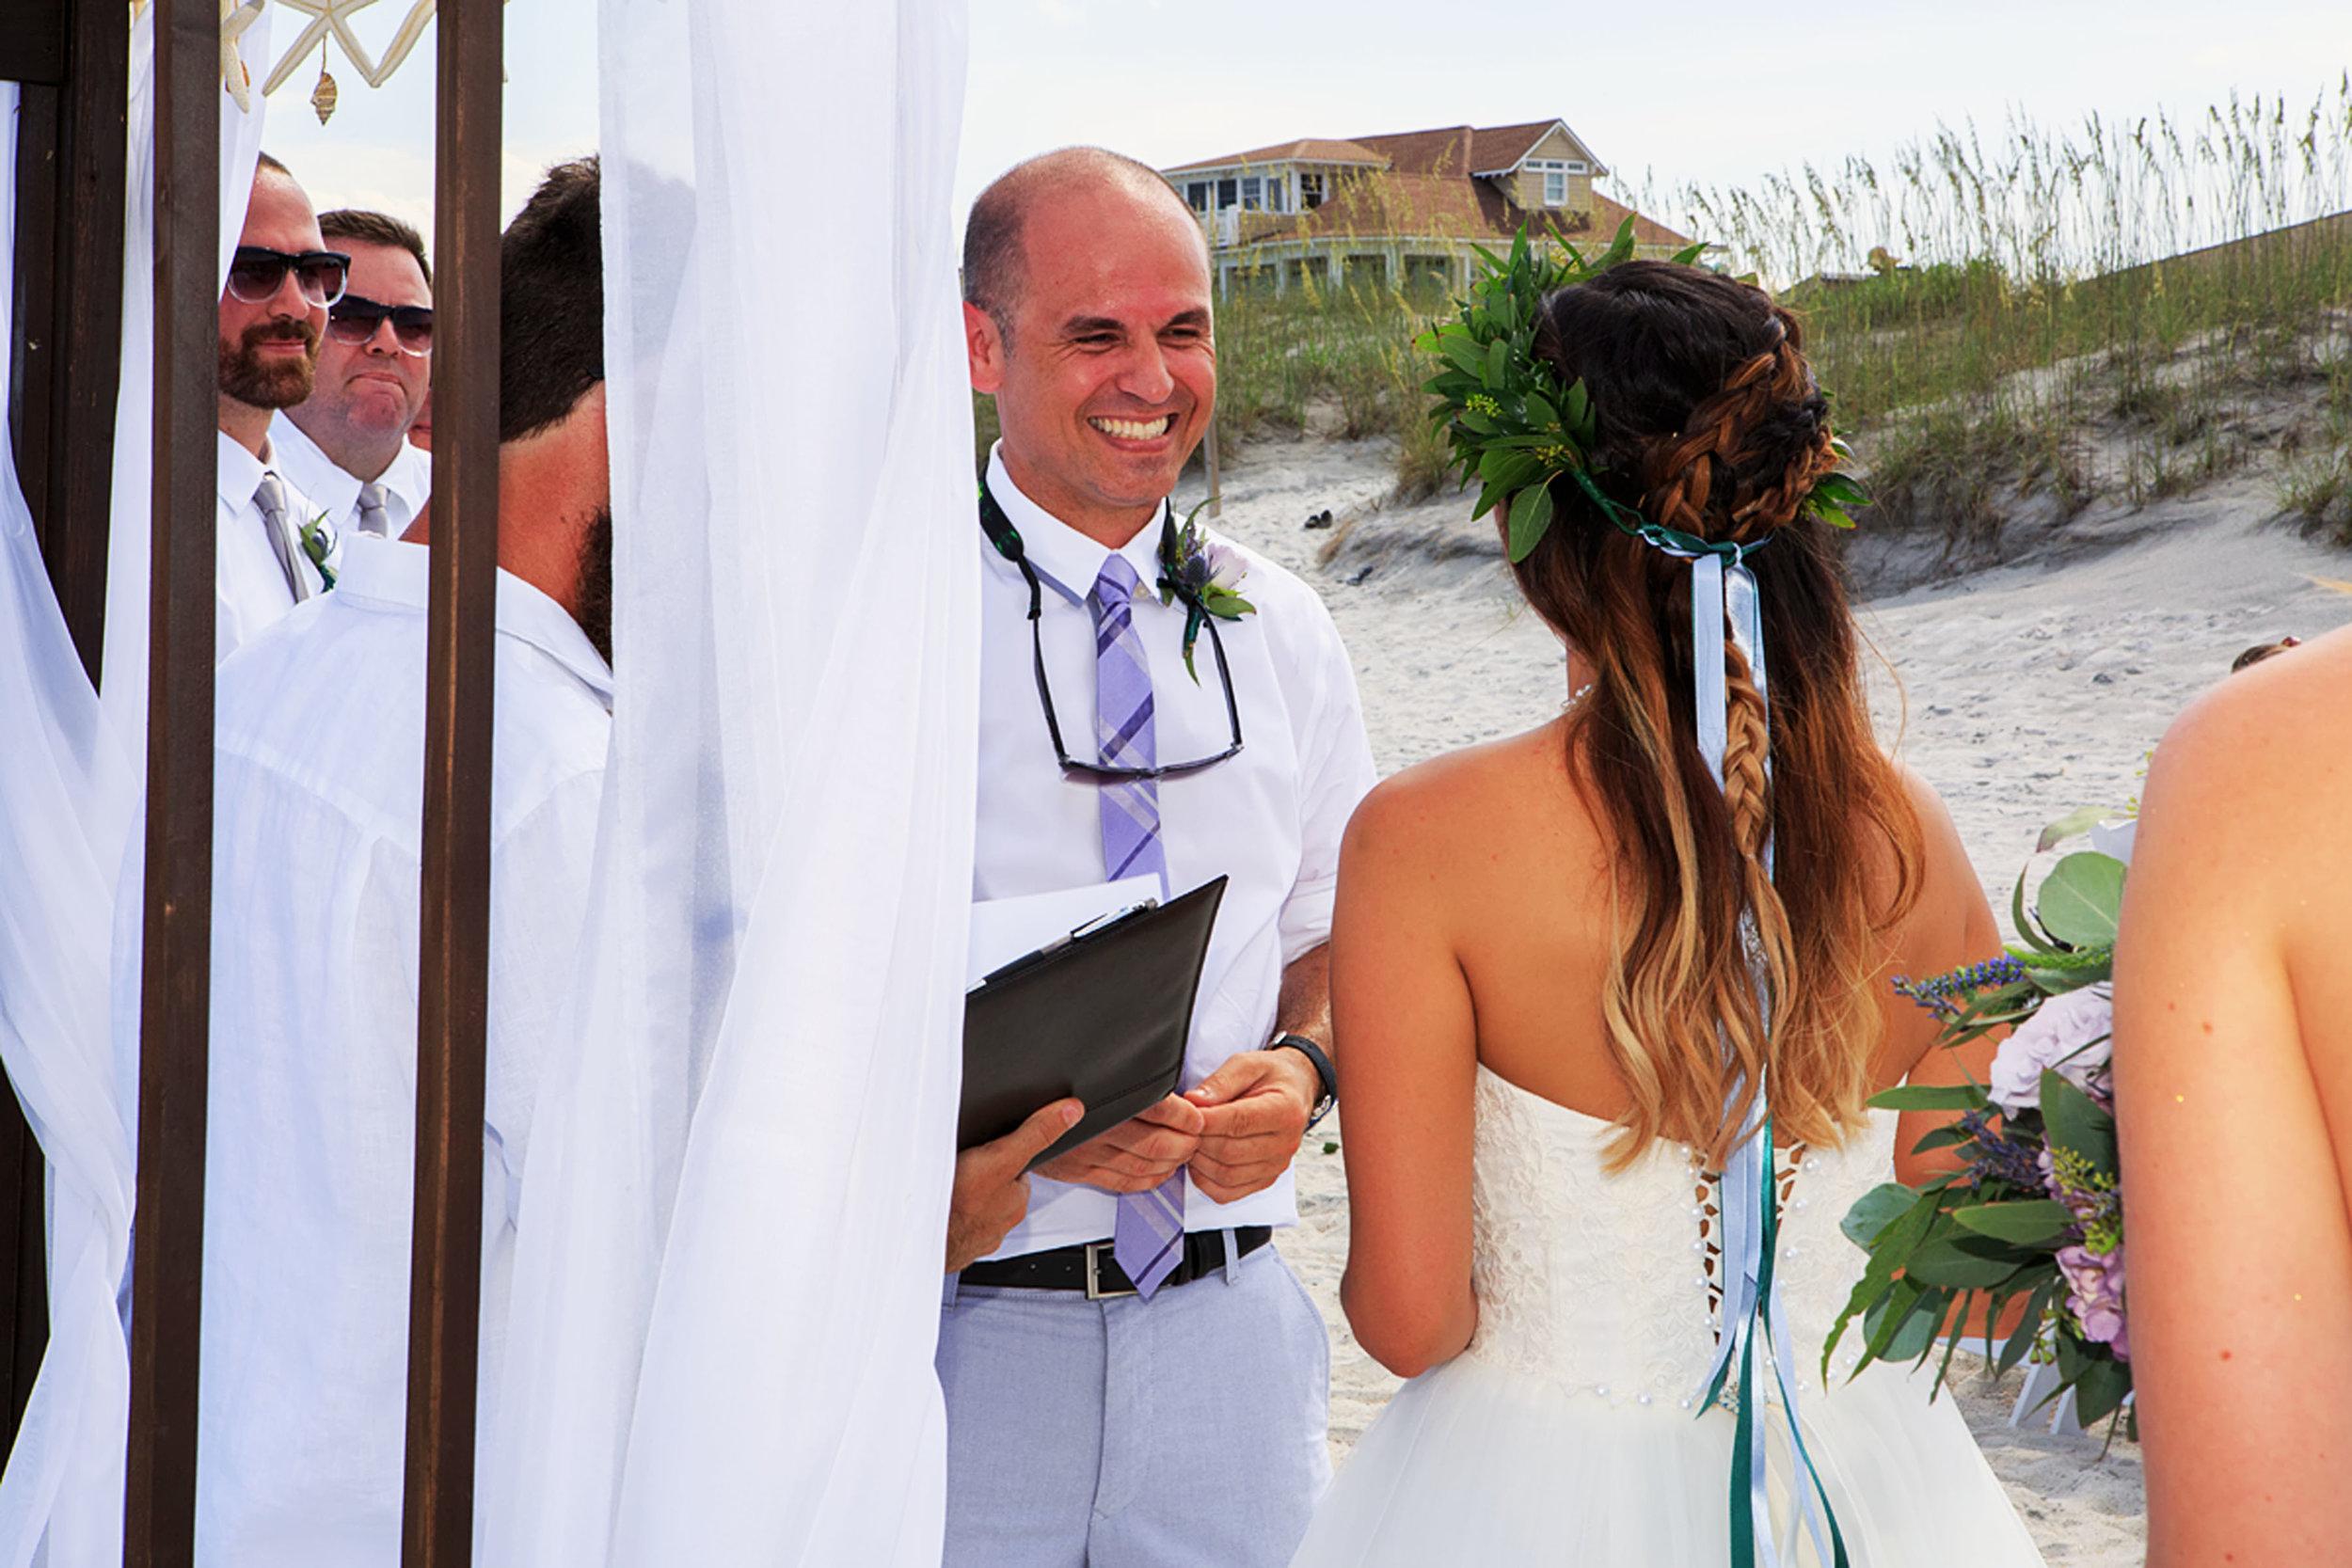 North_Carolina_Wedding_Photographer_Tiffany_Abruzzo_Ceremony_64.jpg